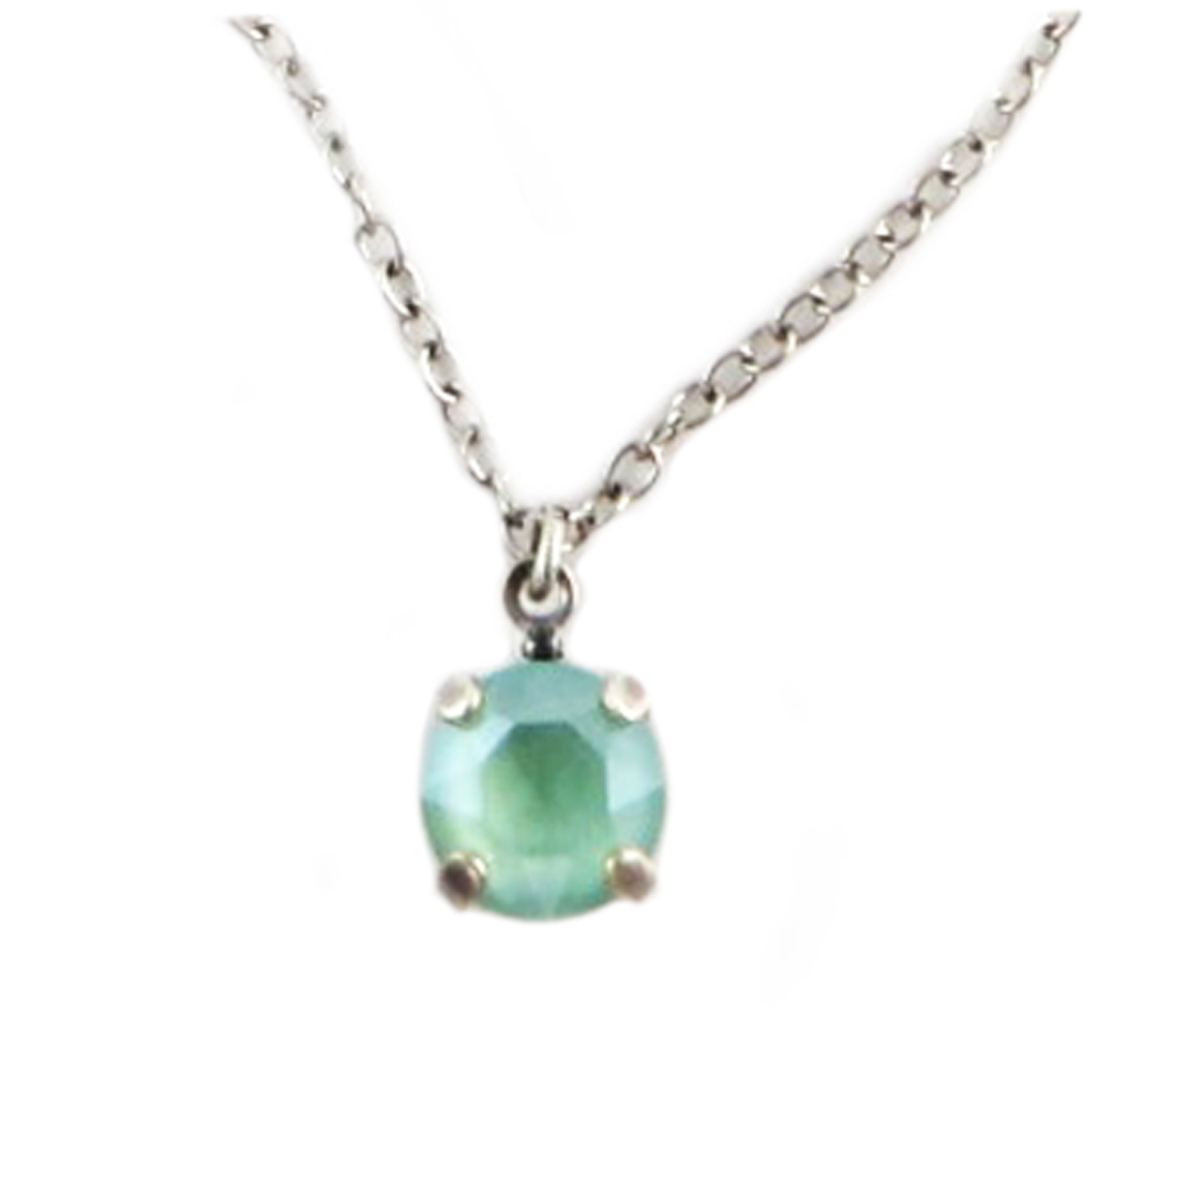 Collier artisanal \'Tsarine\' vert clair argenté - 8 mm - [Q2353]